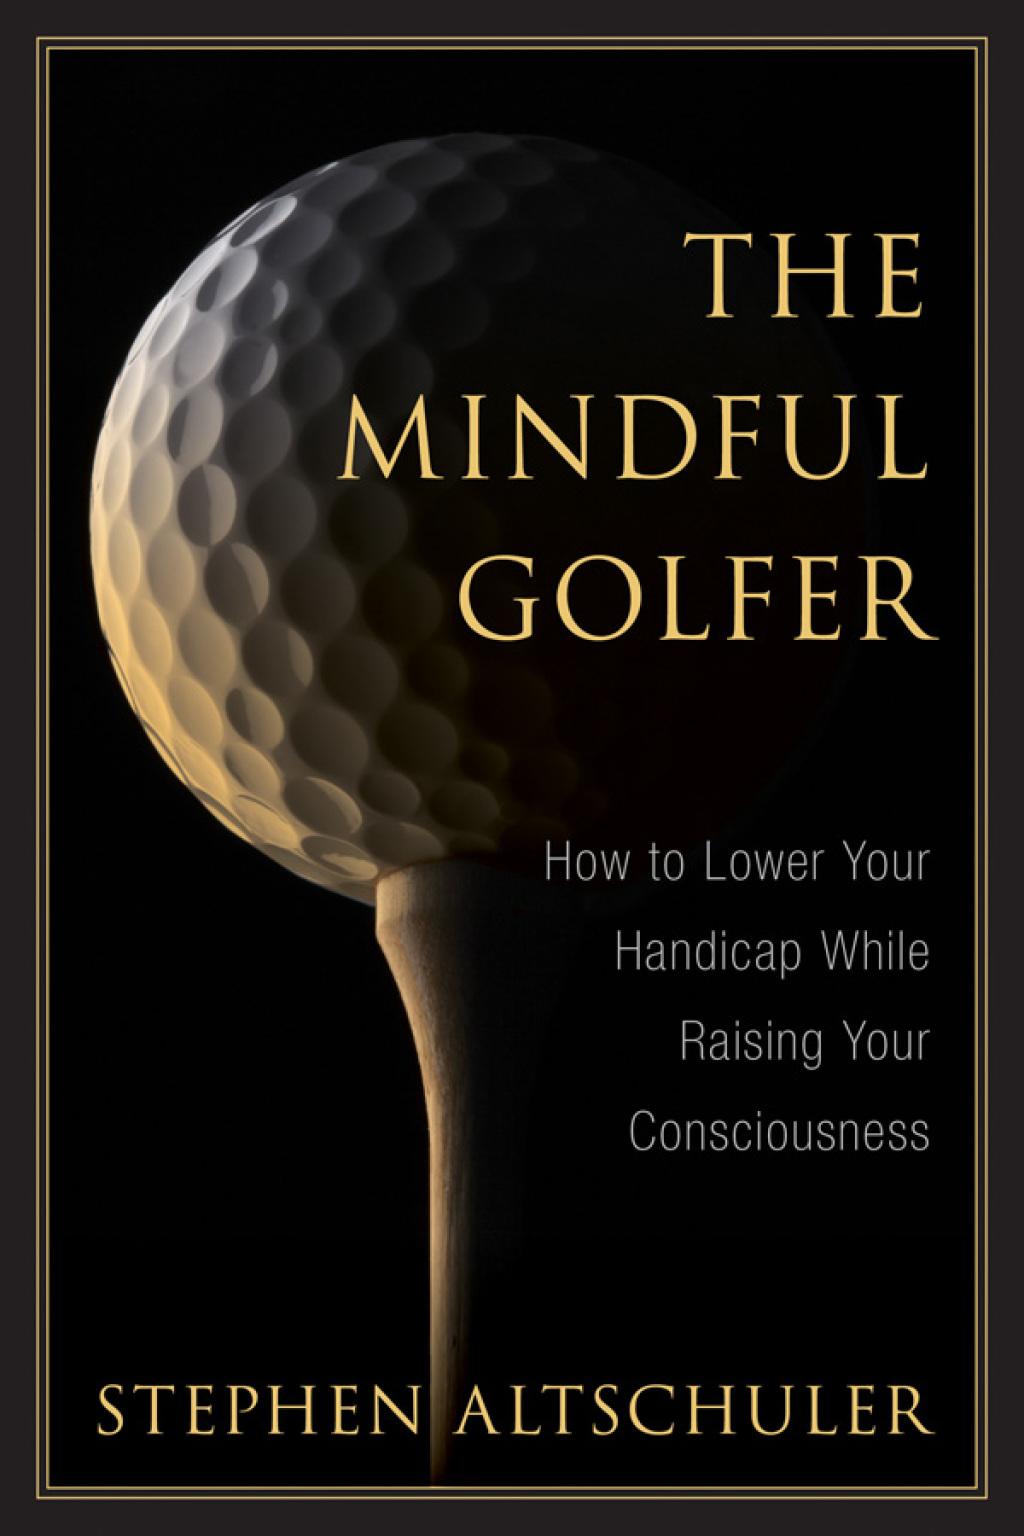 The Mindful Golfer (ebook)